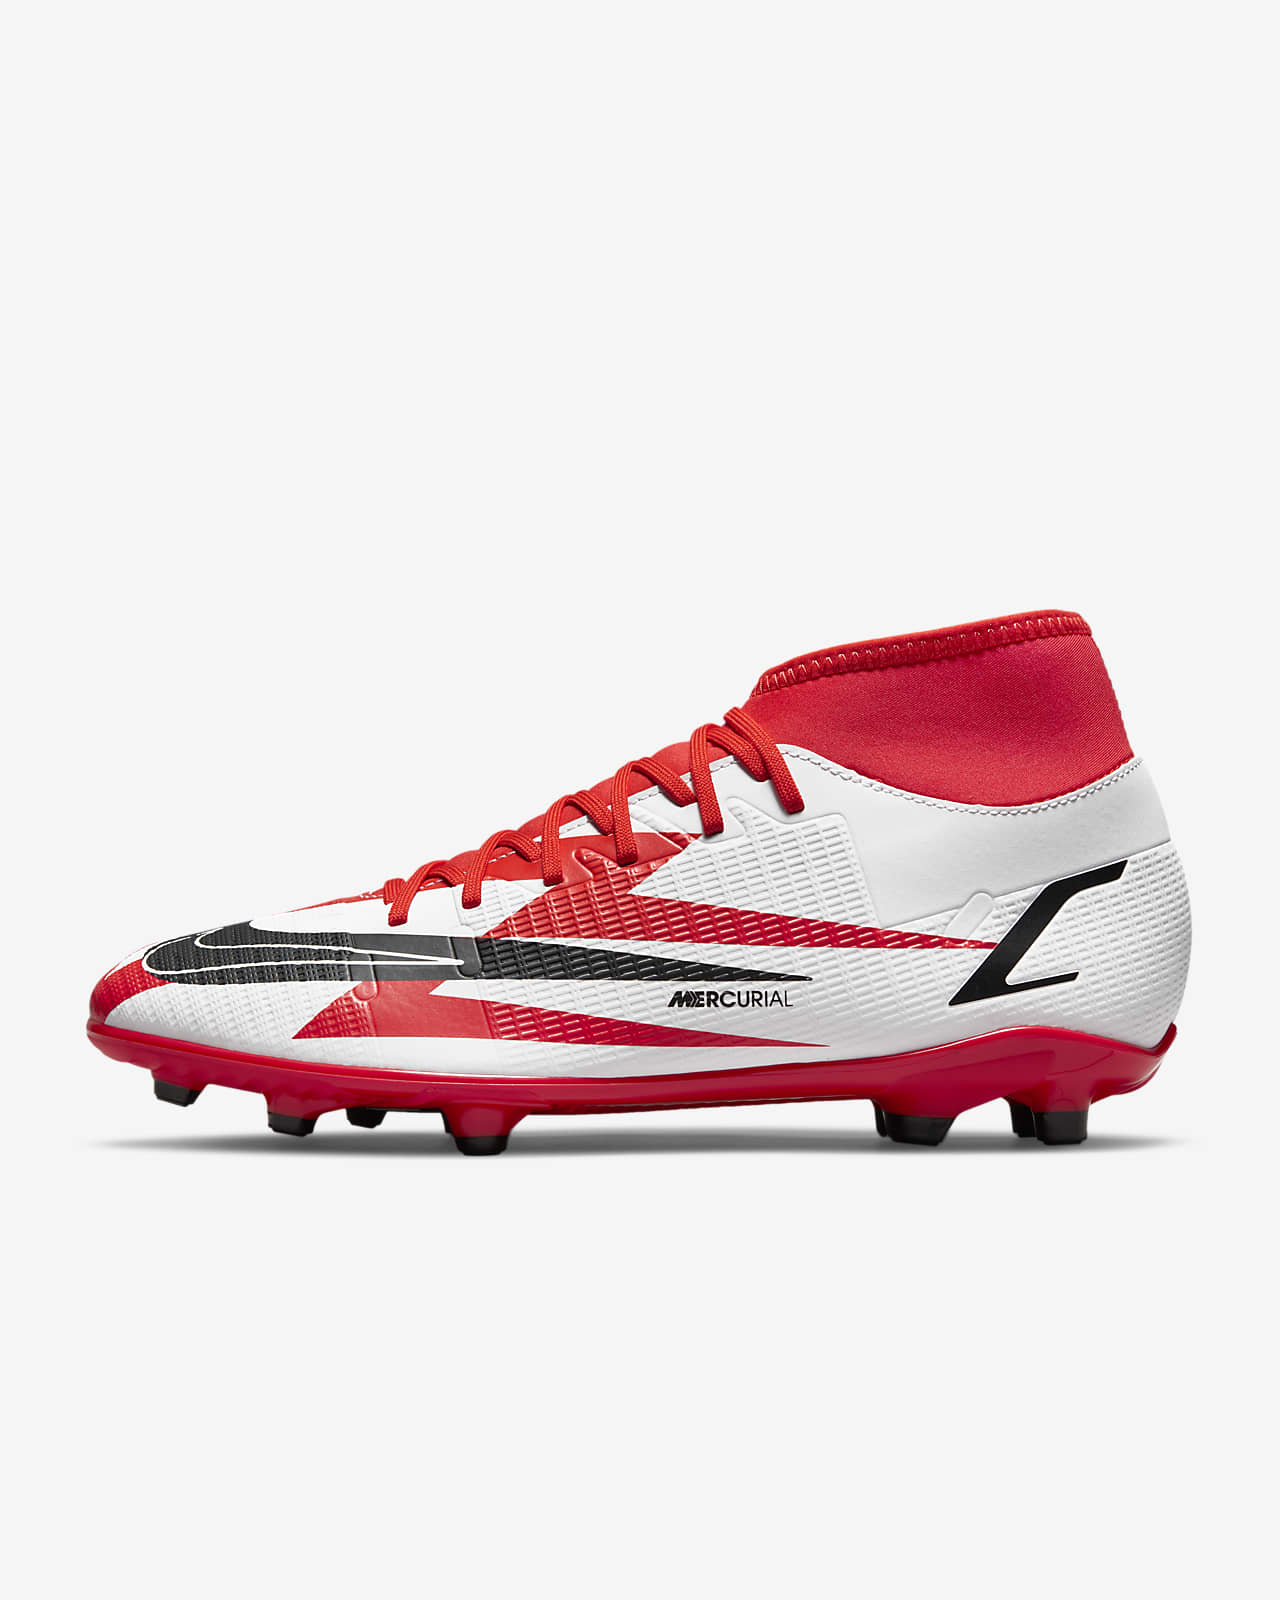 Nike Mercurial Superfly 8 Club CR7 MG Multi-Ground Football Boot